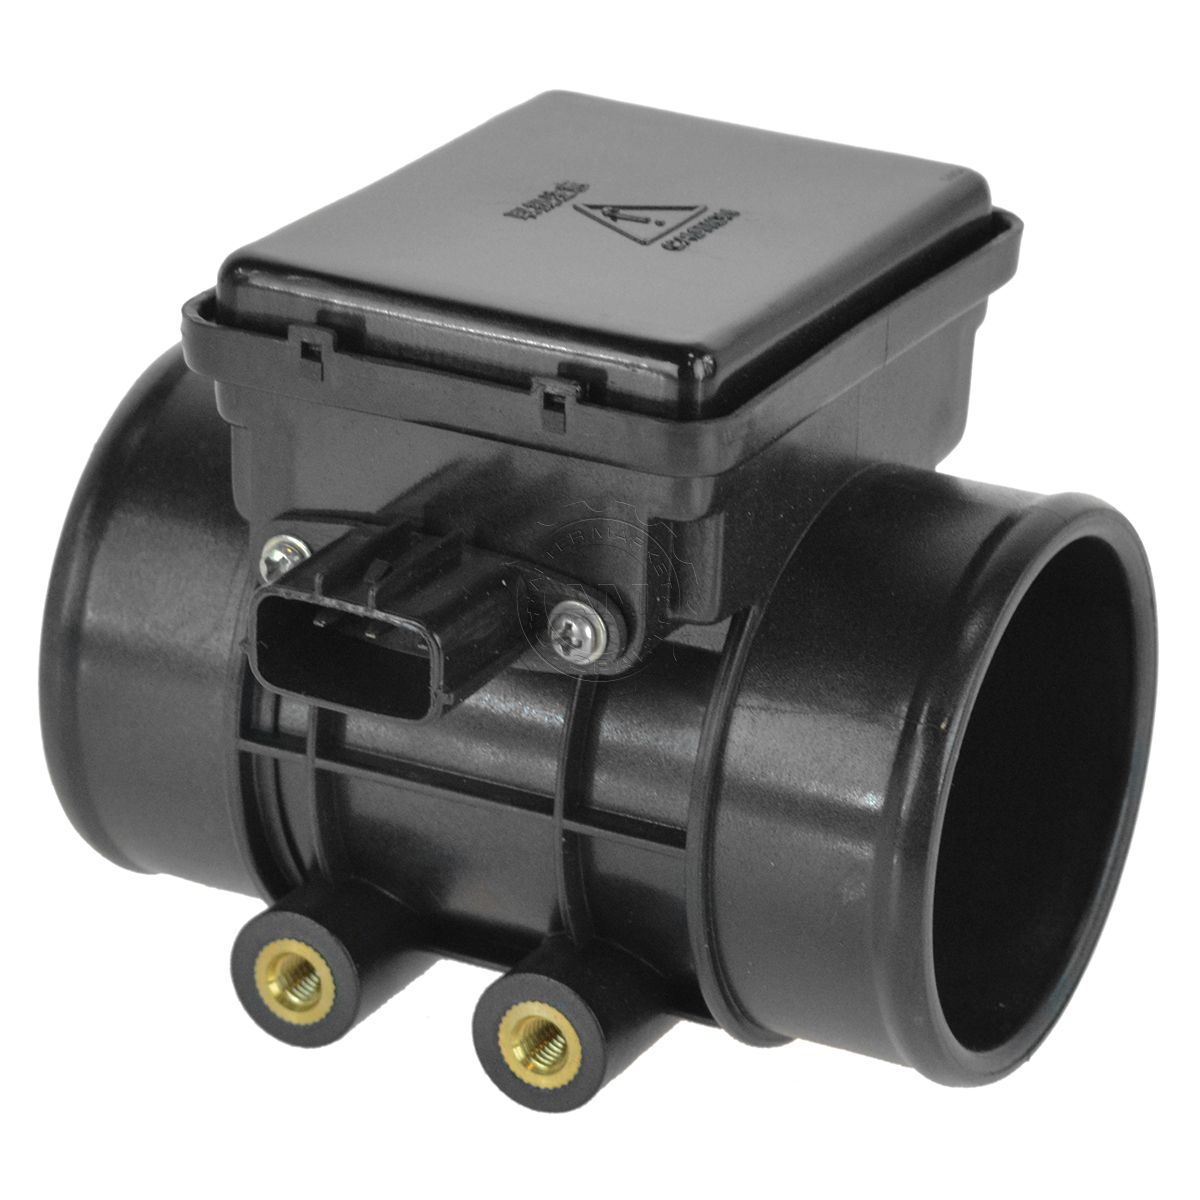 Mass Air Flow Meter Sensor For 94-98 Ford Aspire Mazda 323